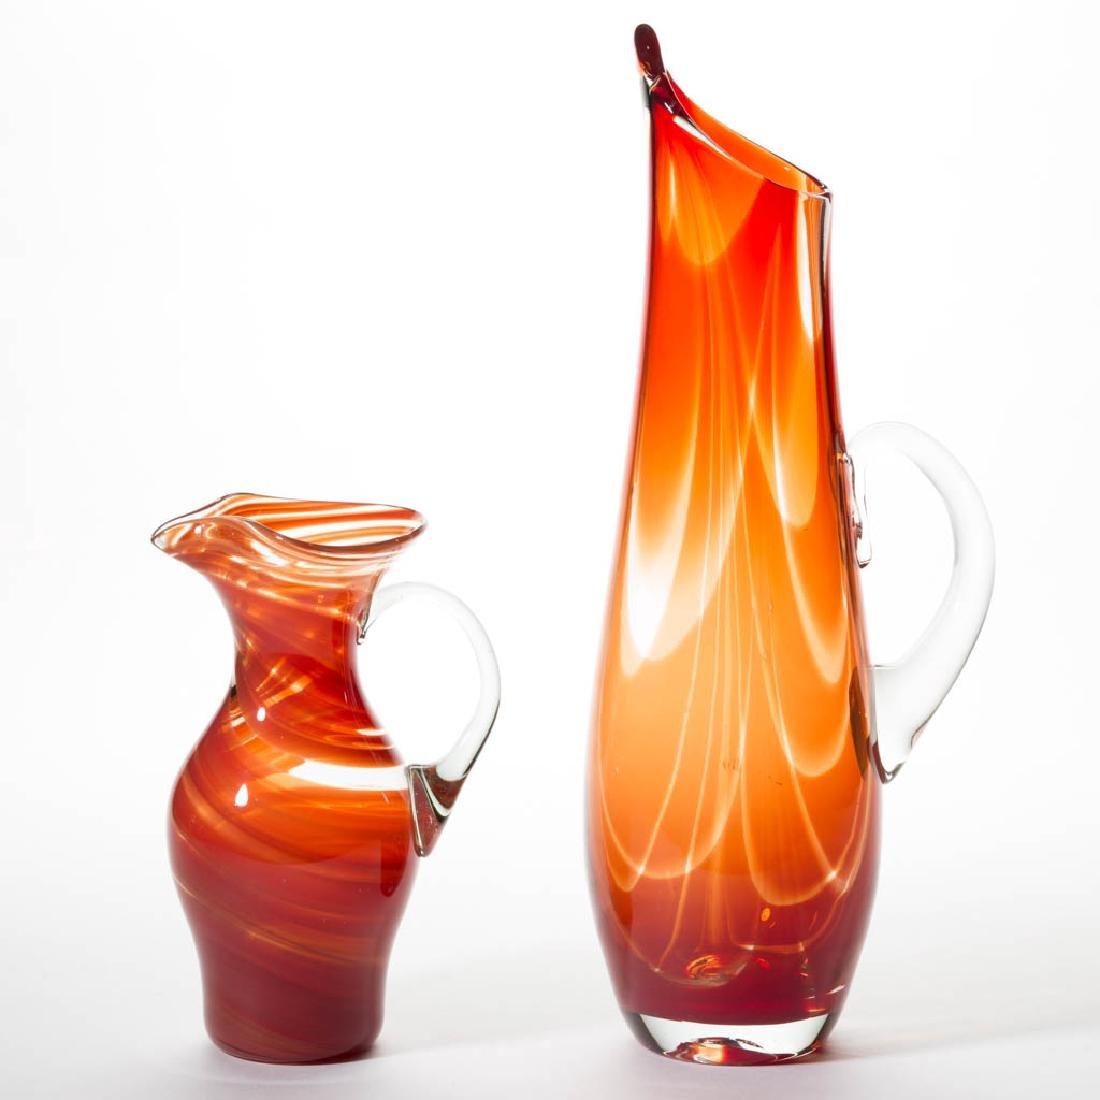 BLENKO CHARISMA GLASS - JOHN NICKERSON PITCHERS, LOT OF